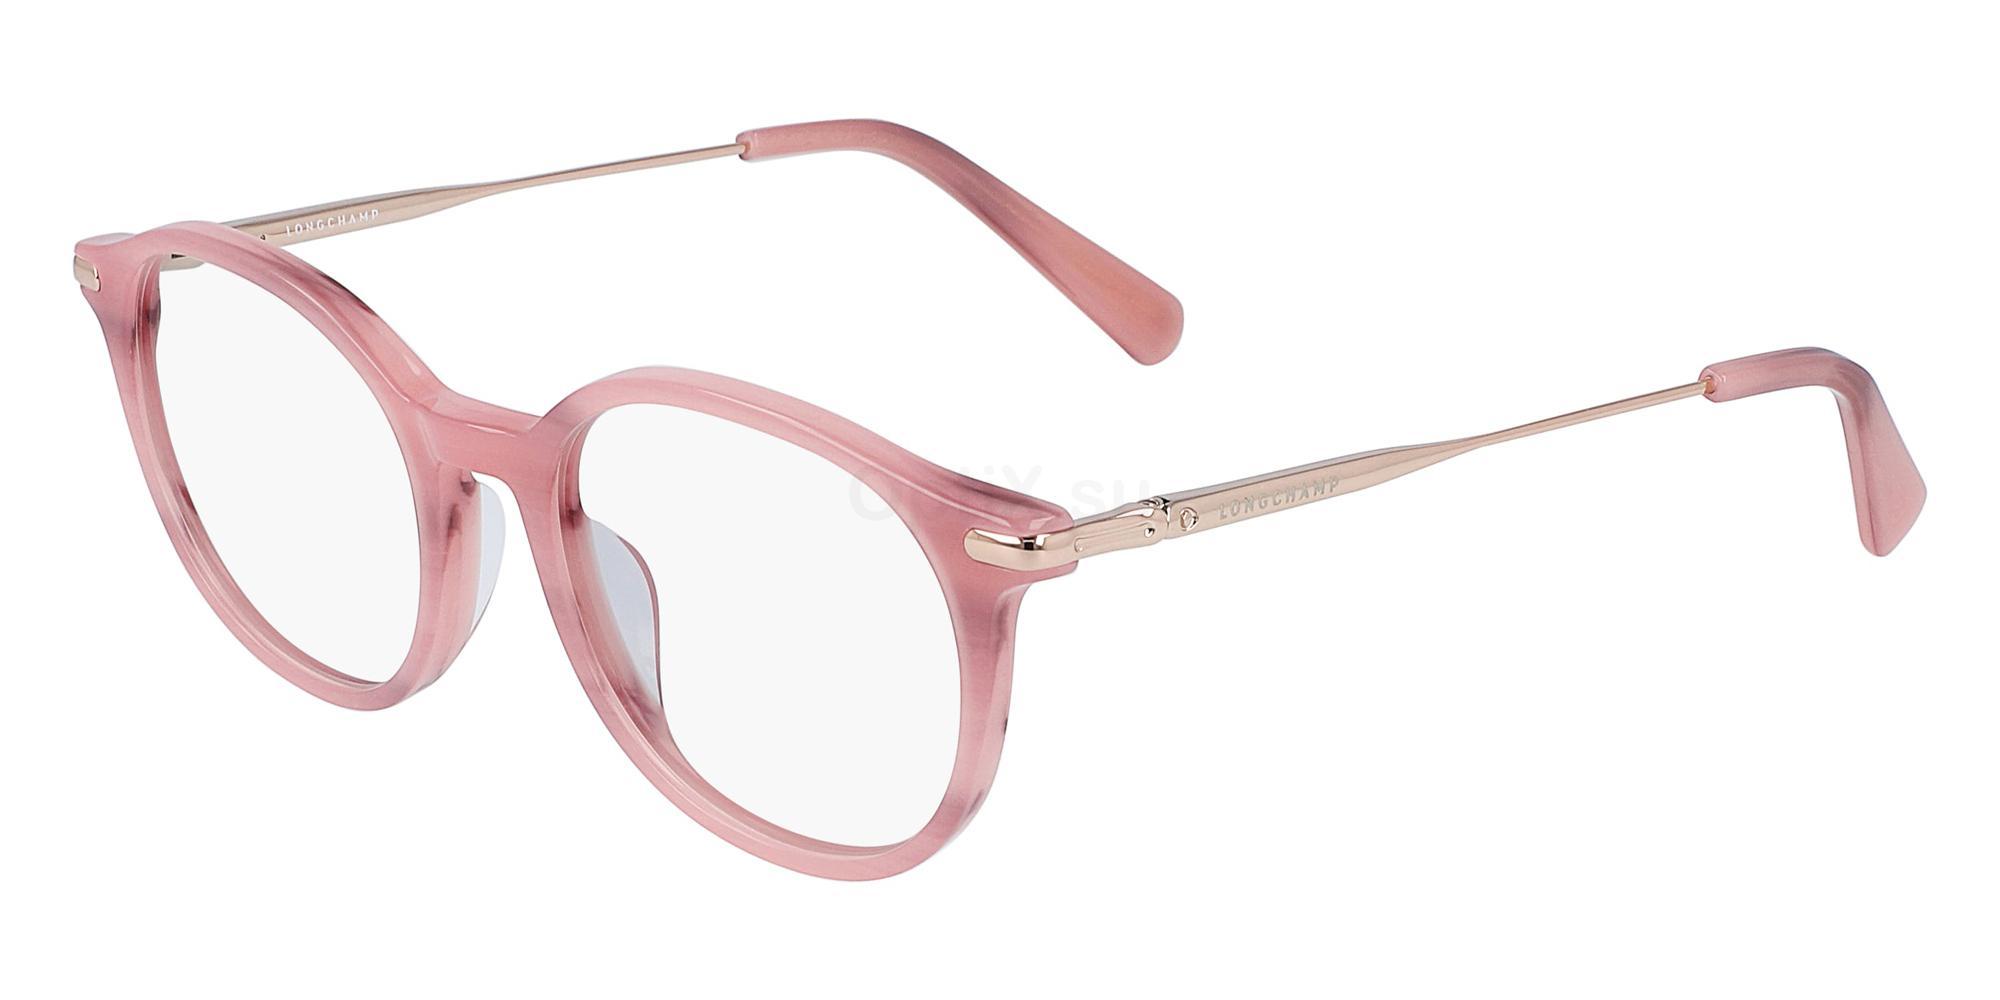 606 LO2655 Glasses, LONGCHAMP